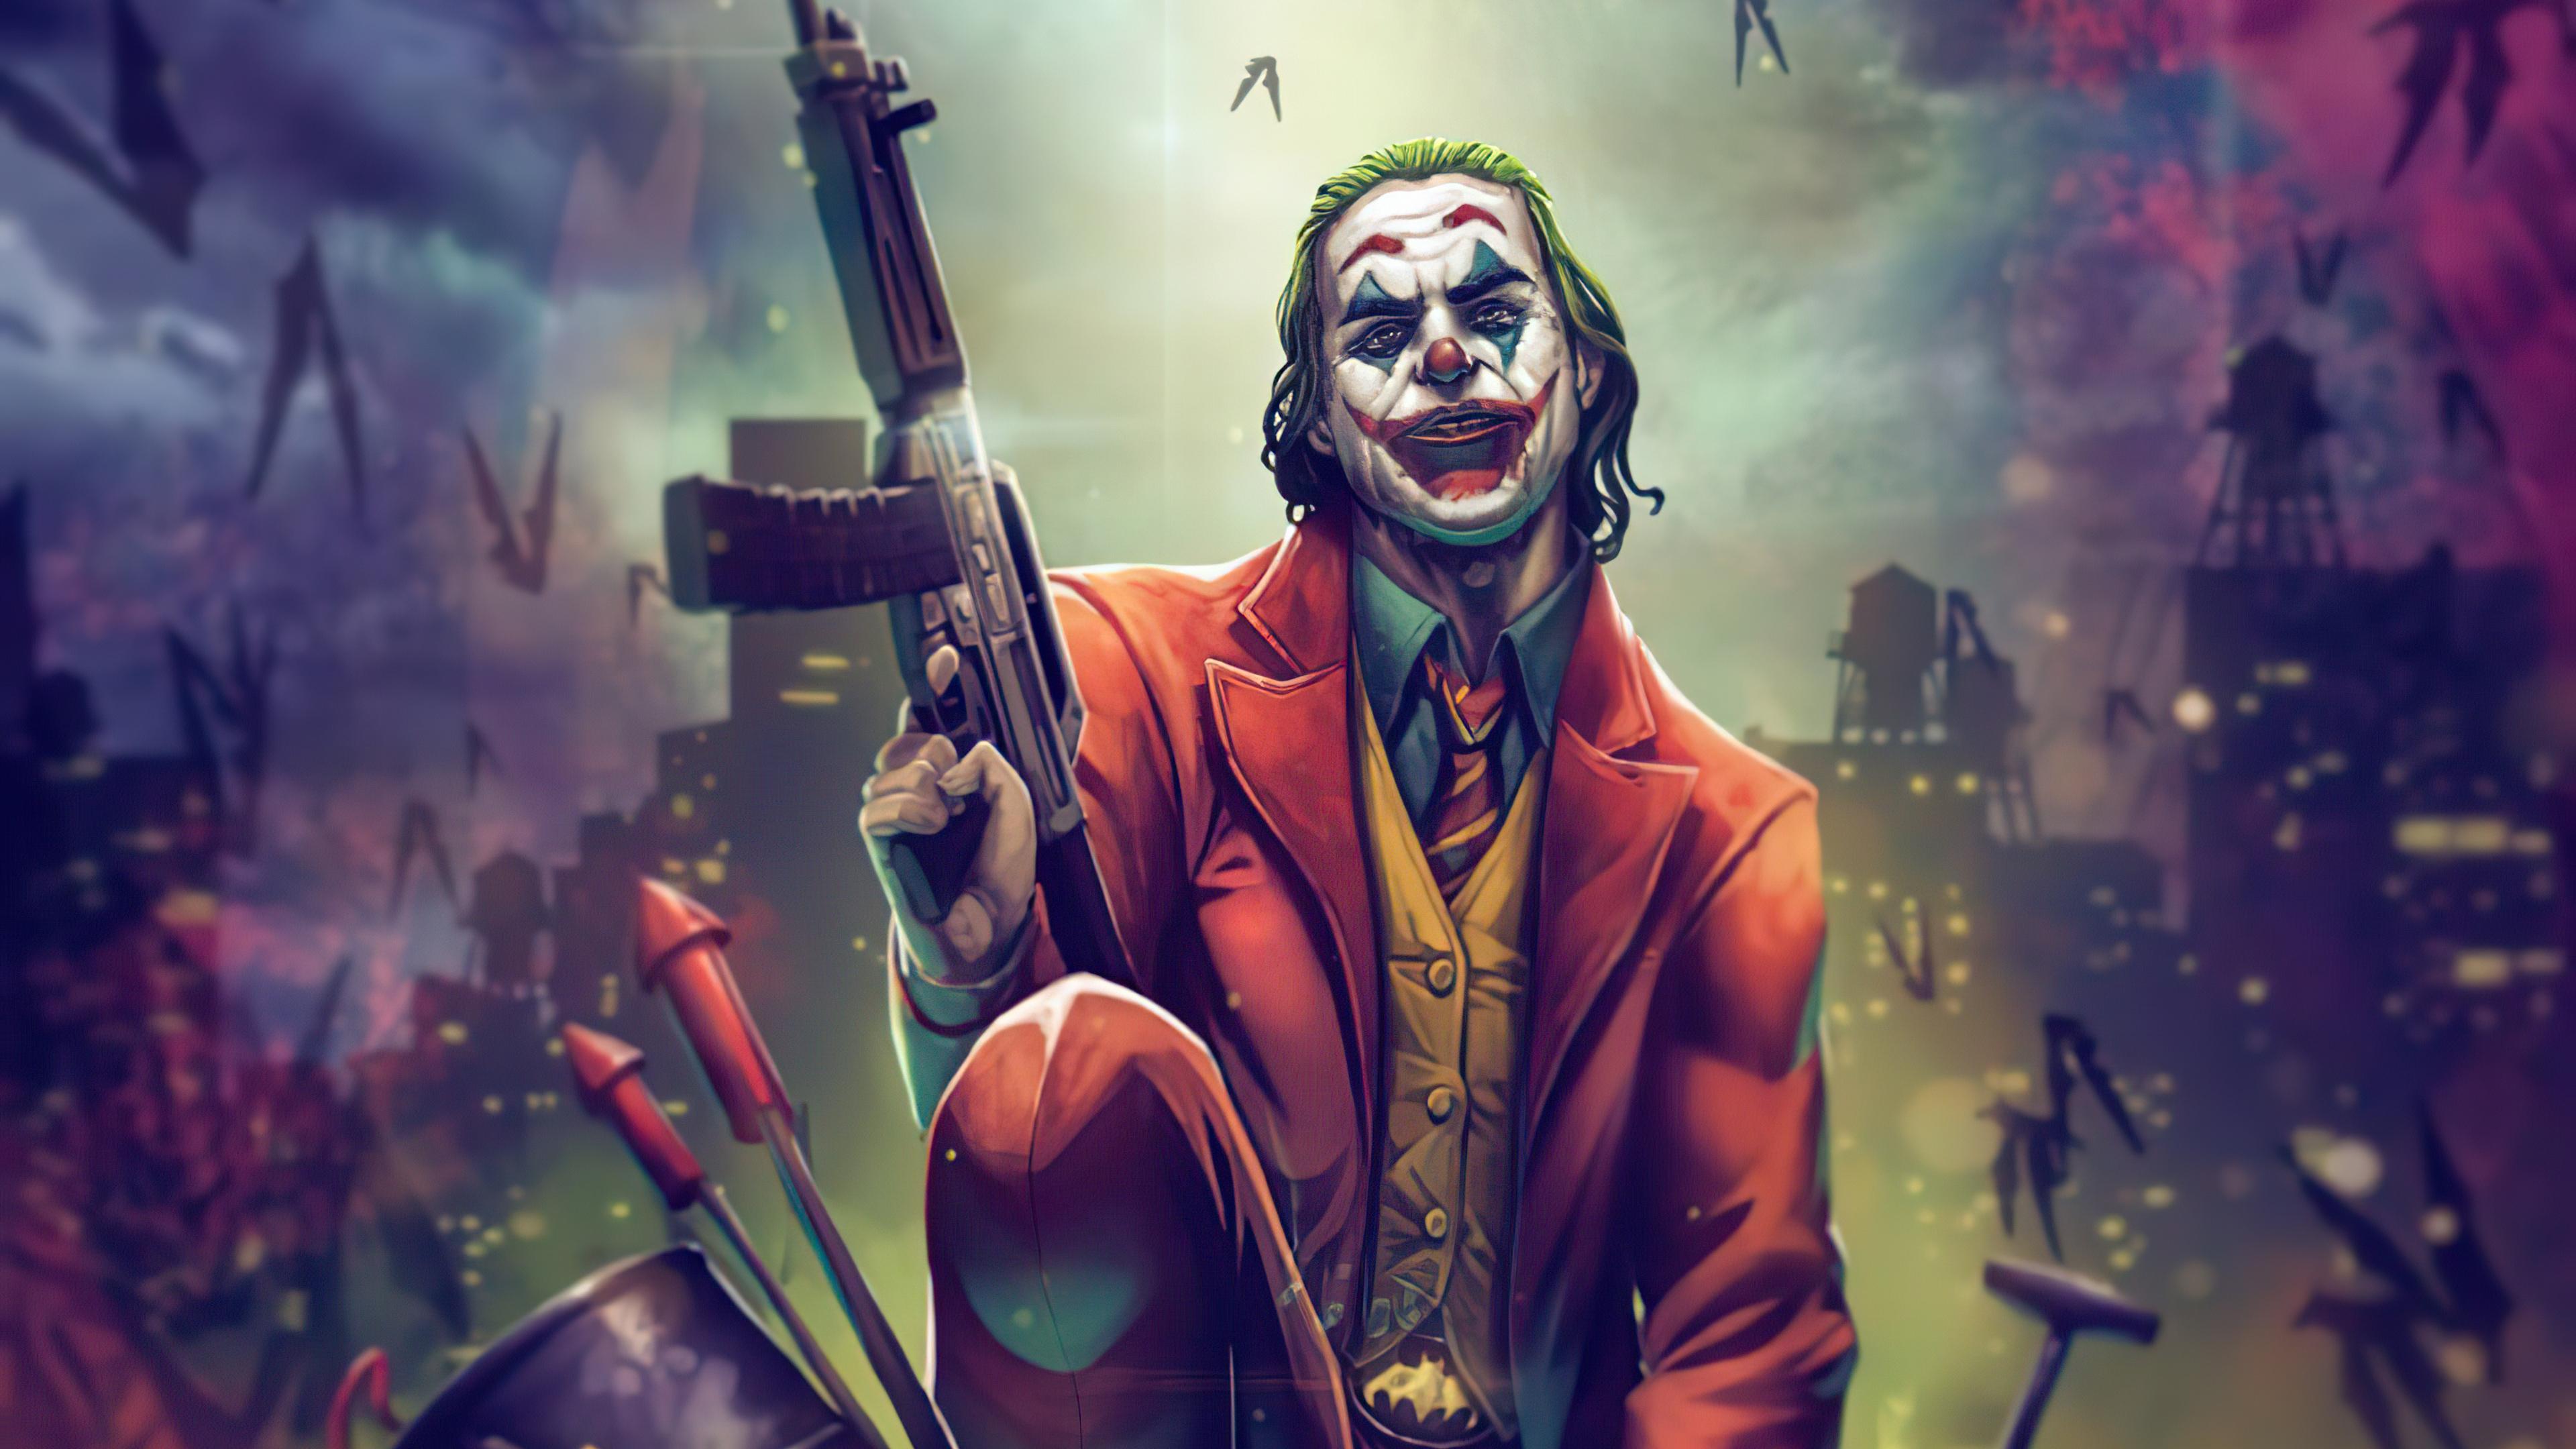 1920x1080 DC Joker Art 1080P Laptop Full HD Wallpaper, HD ...